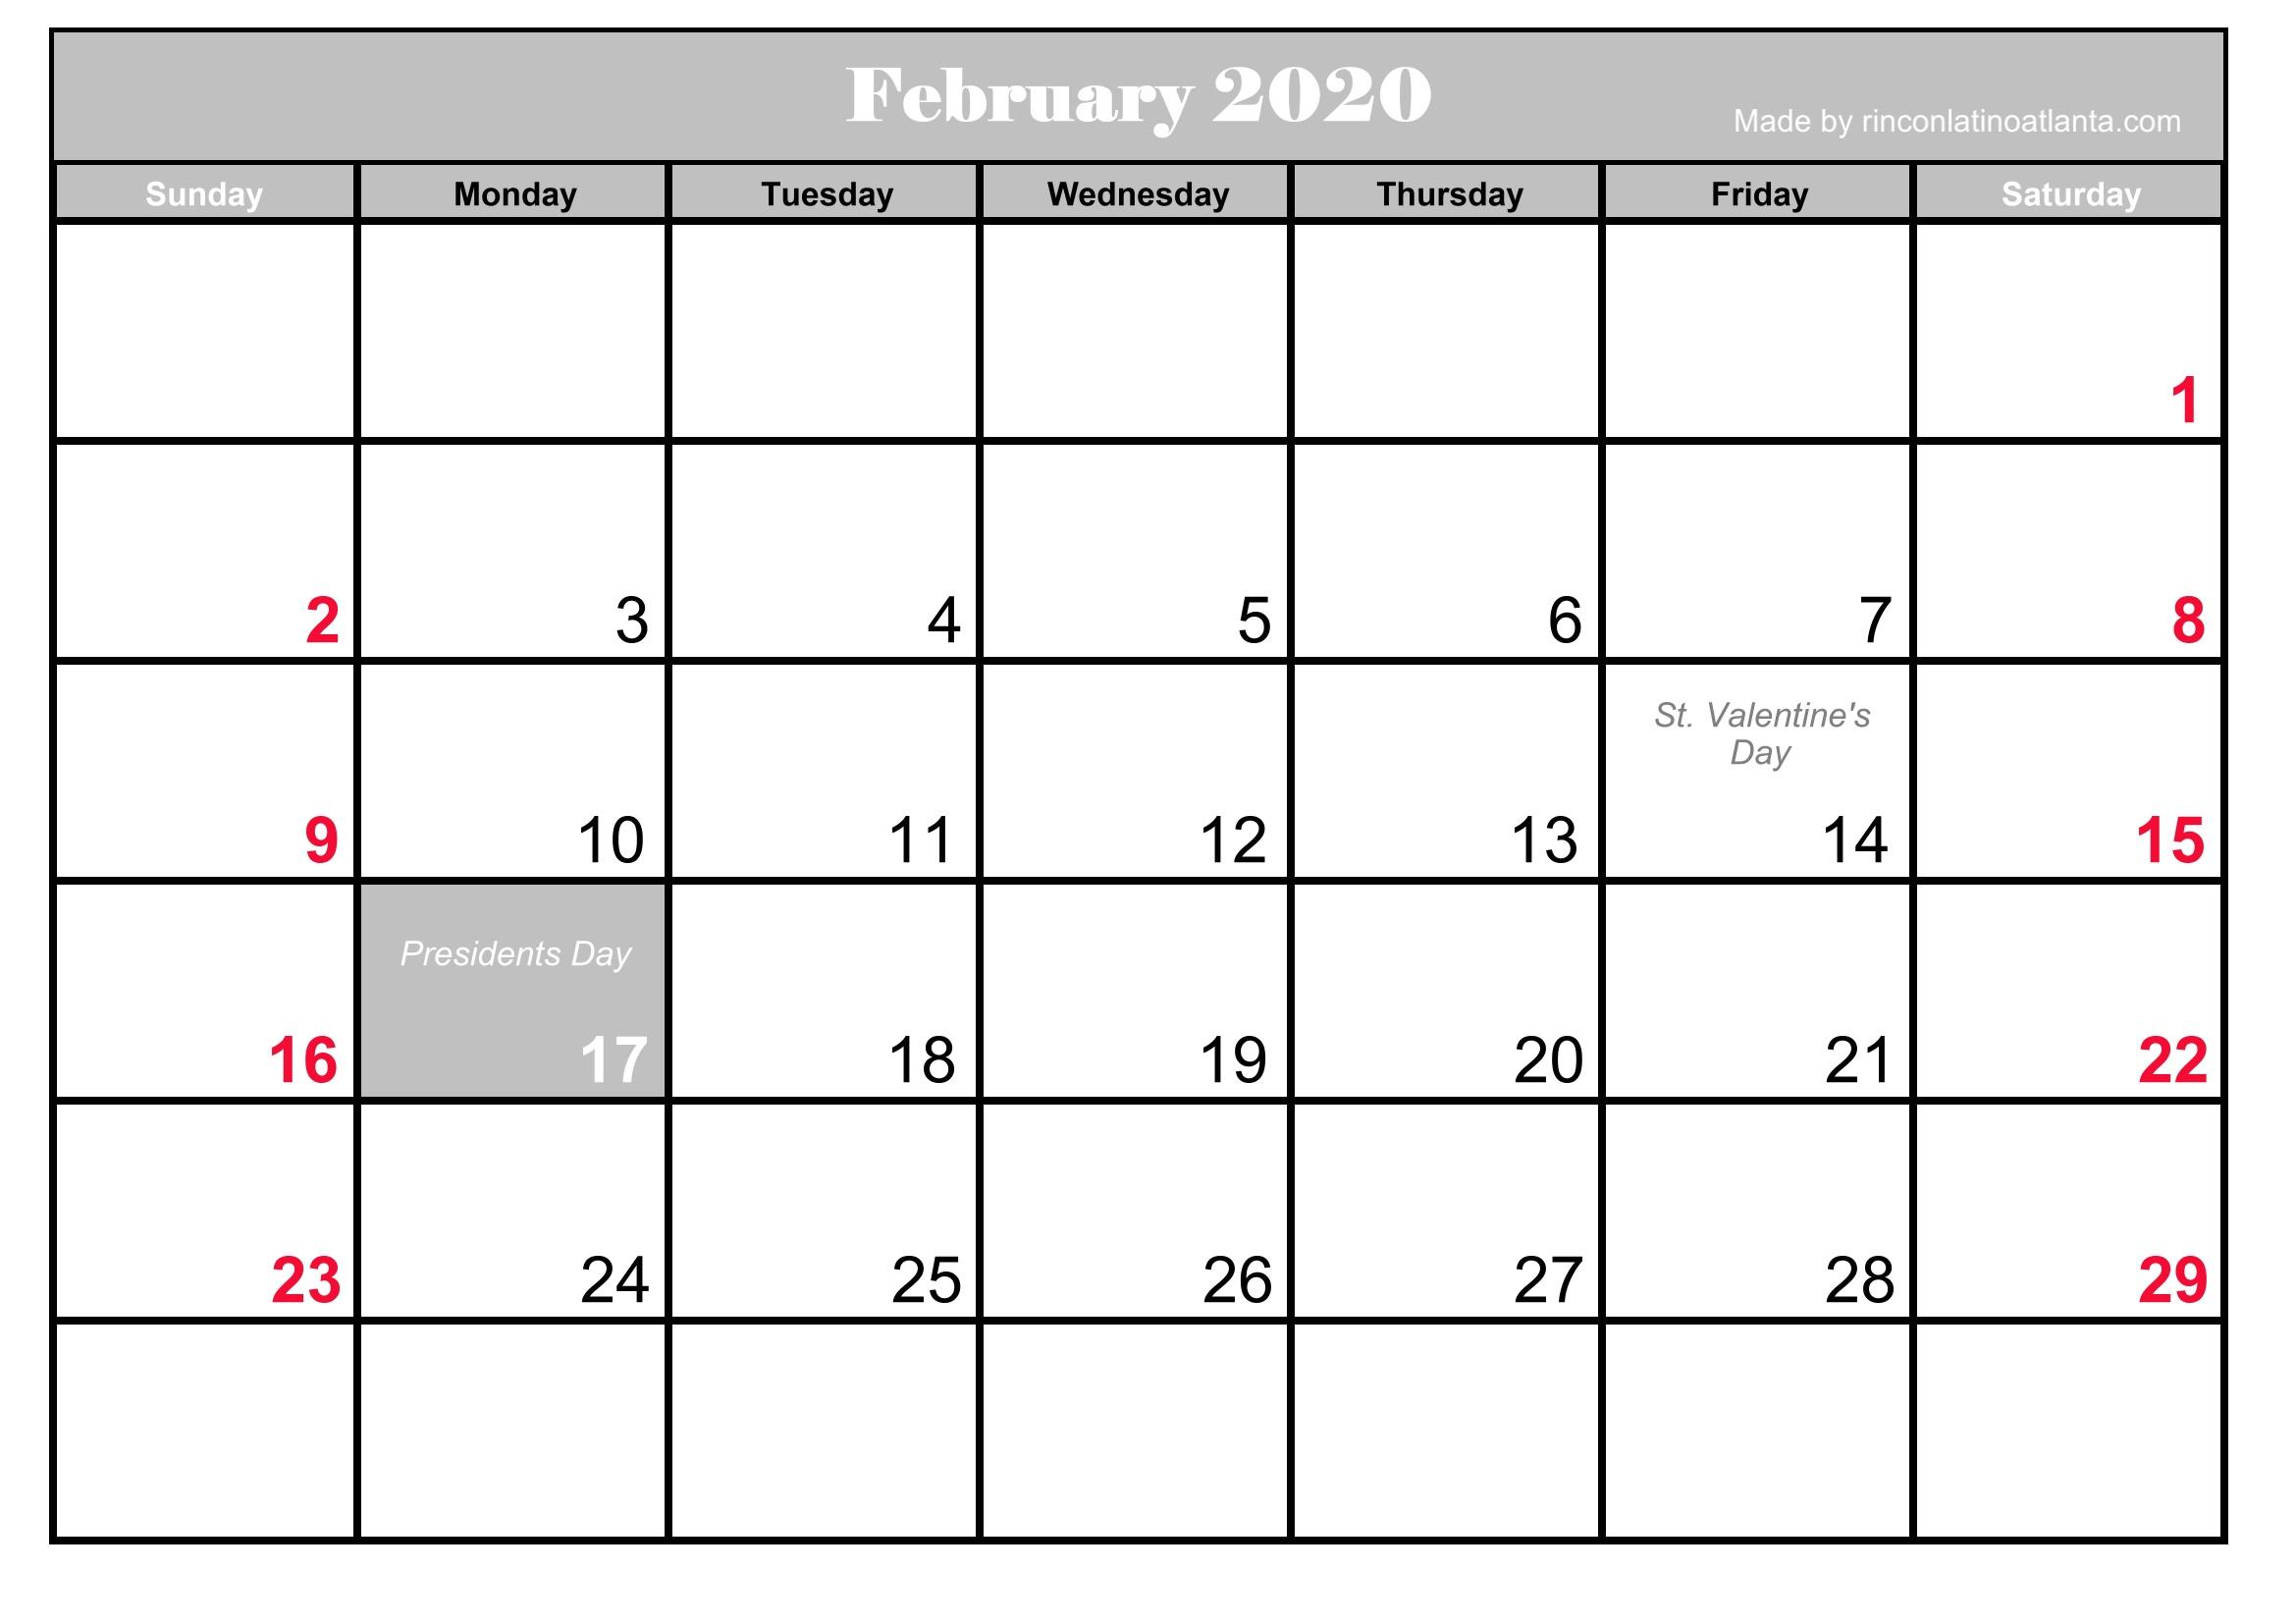 Presidents Day 2020 Calendar.Printable Frebruary 2020 Calendar With Holidays Calendar Template